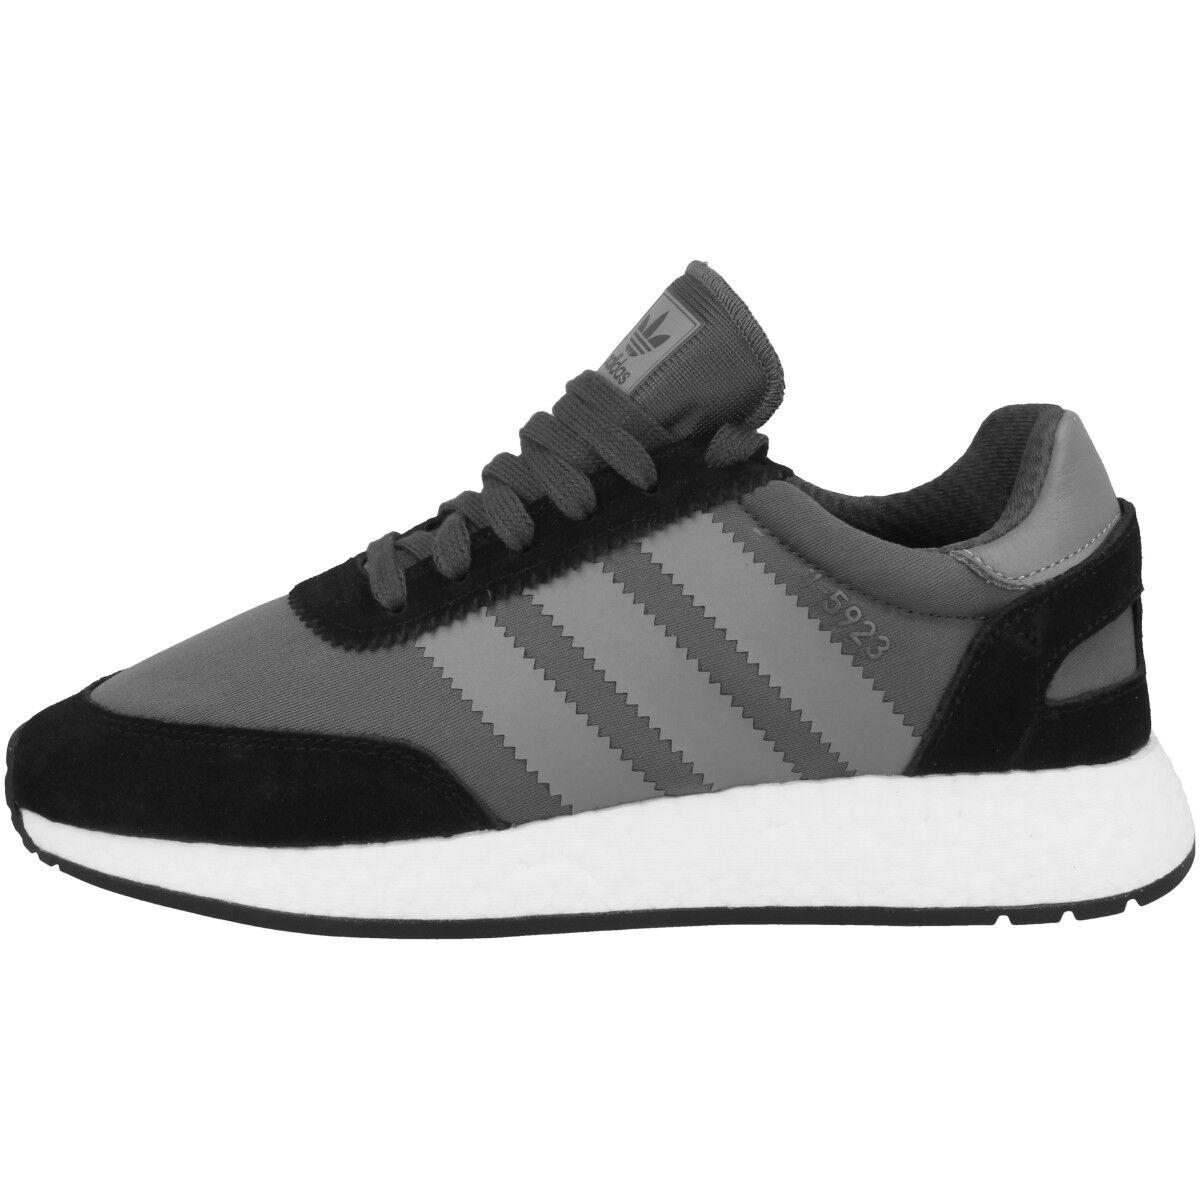 Adidas i -5923 kvinnor skor kvinnor Originals Casual skor Trainers d97353